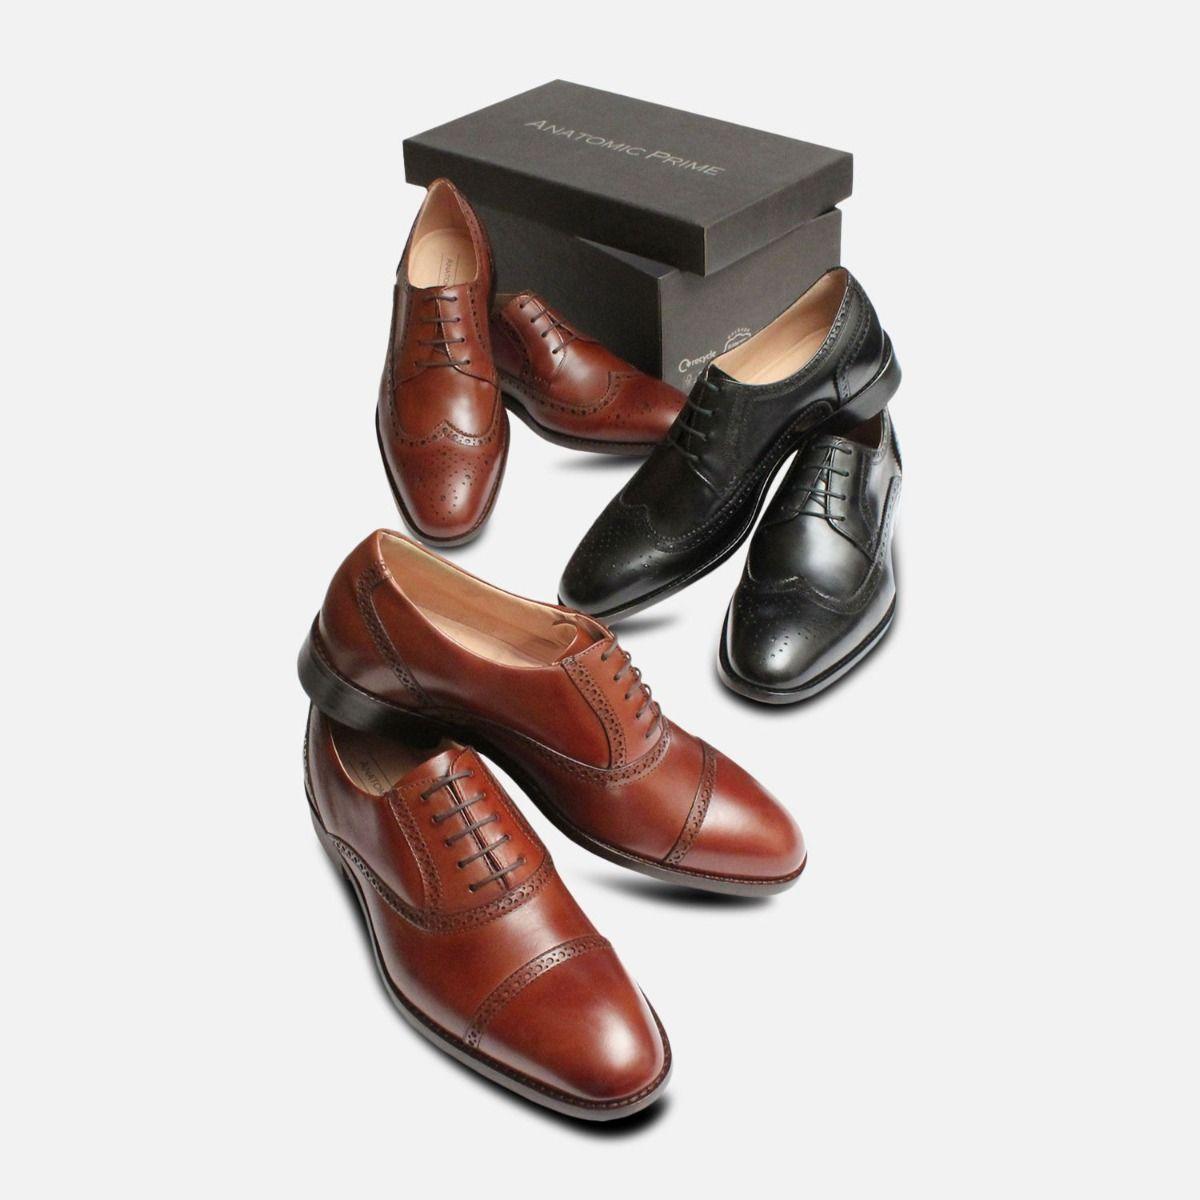 Black Kidskin Mens Wingcap Brogues by Anatomic Shoes